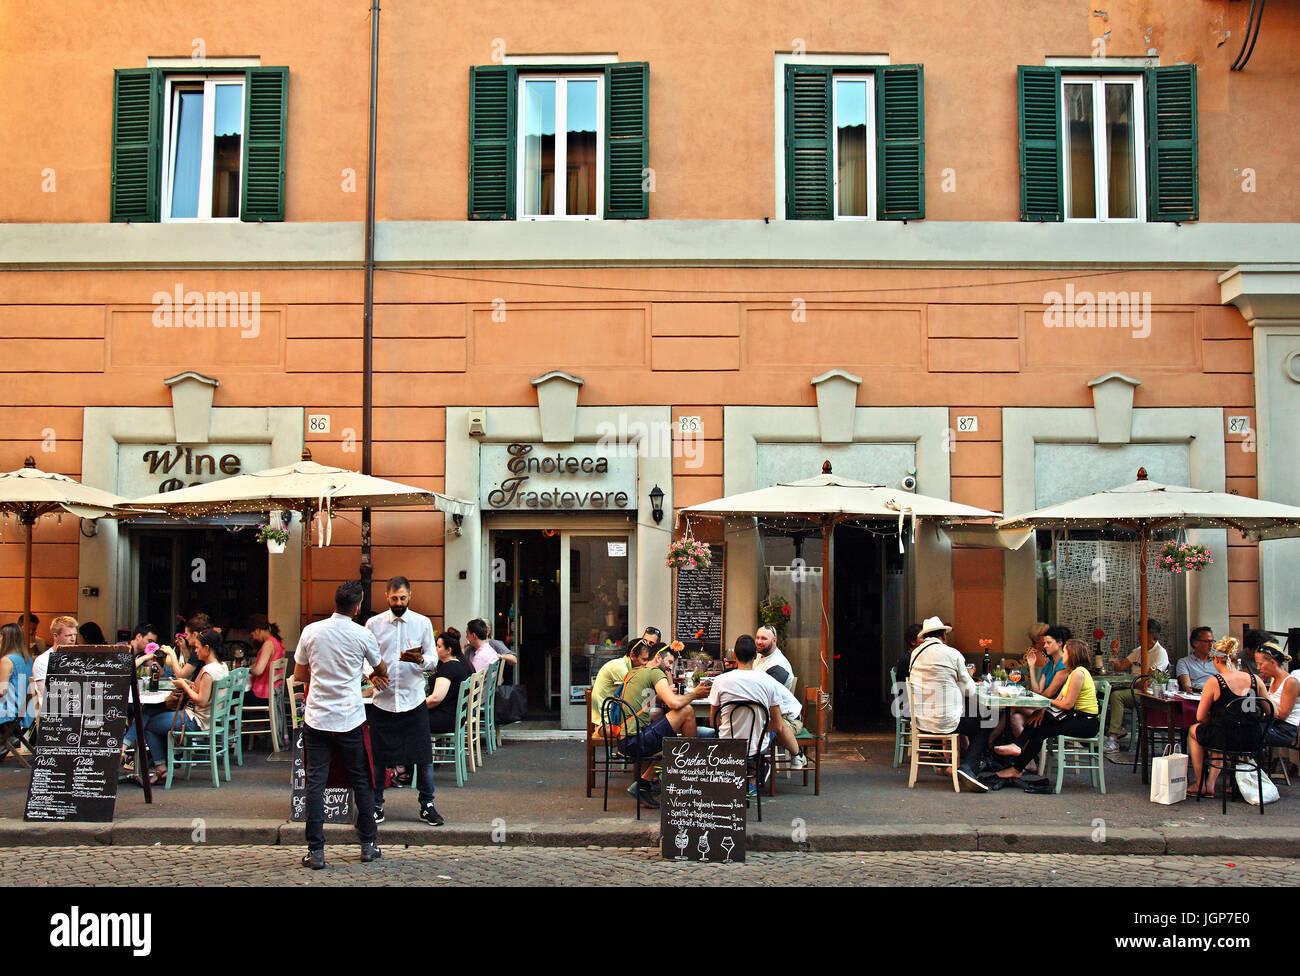 "Wine bar - ristorante (""Enoteca Trastevere') a Trastevere, Roma, Italia Immagini Stock"